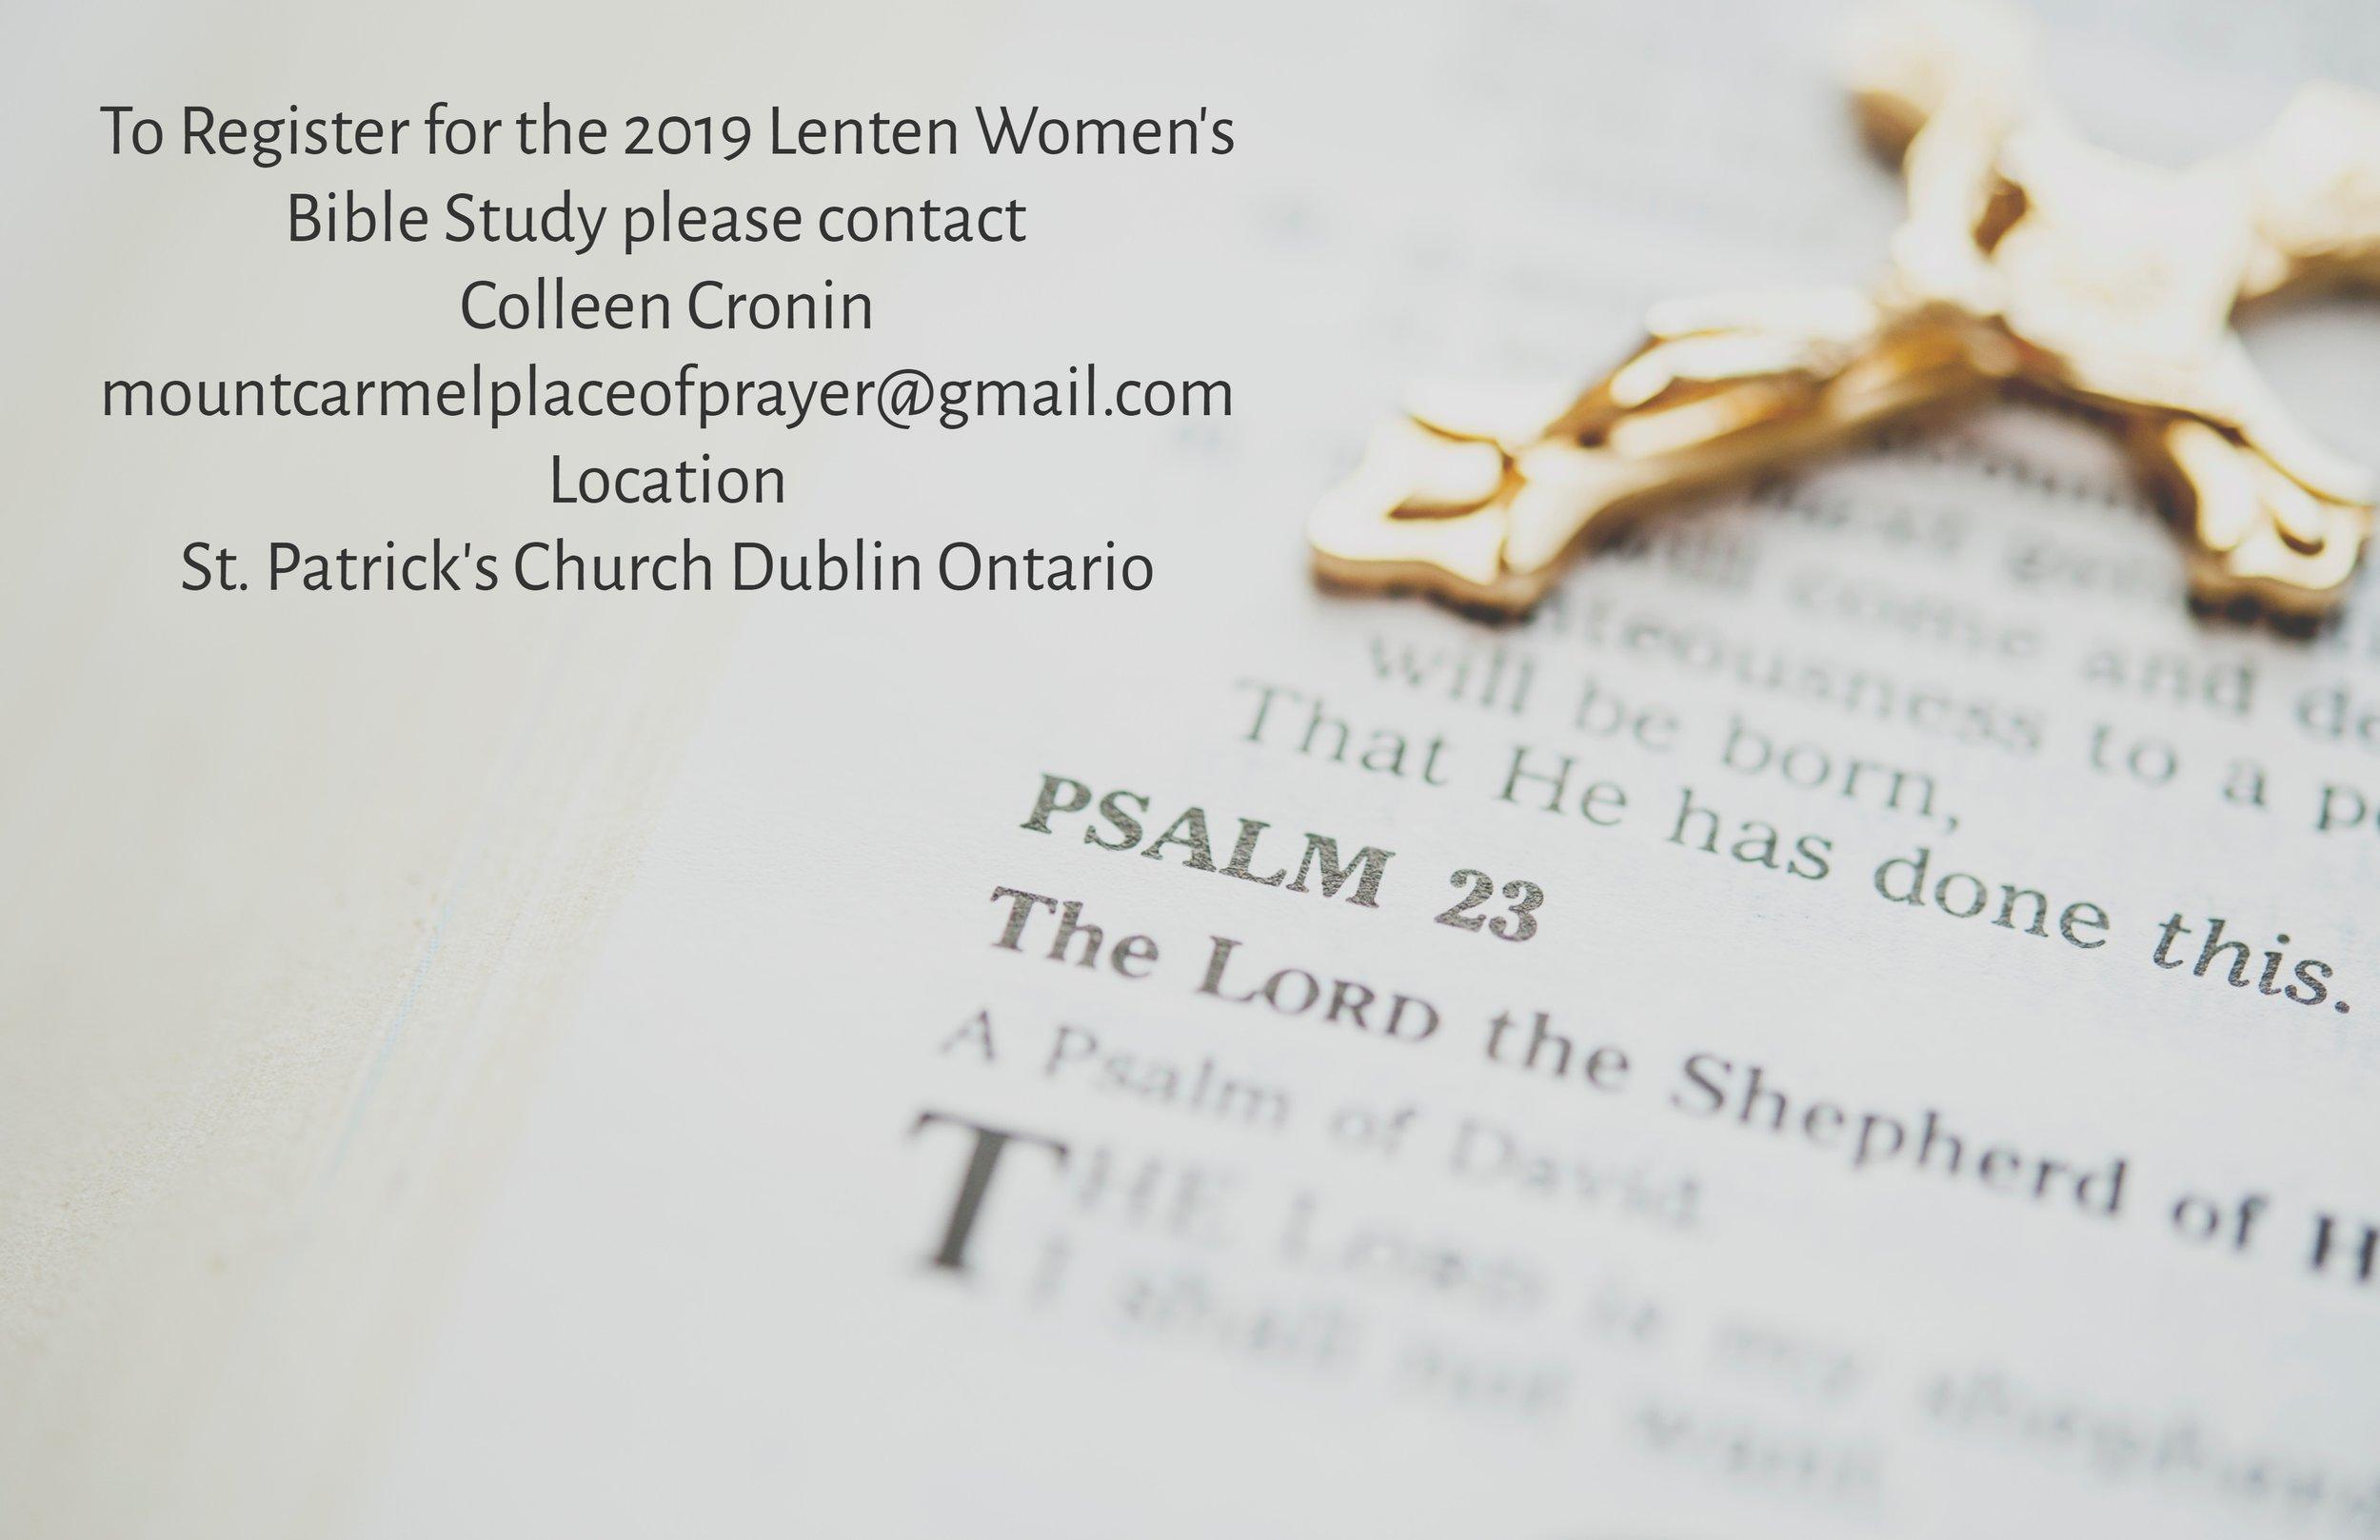 2019 Lenten Bible Study for Women.jpg